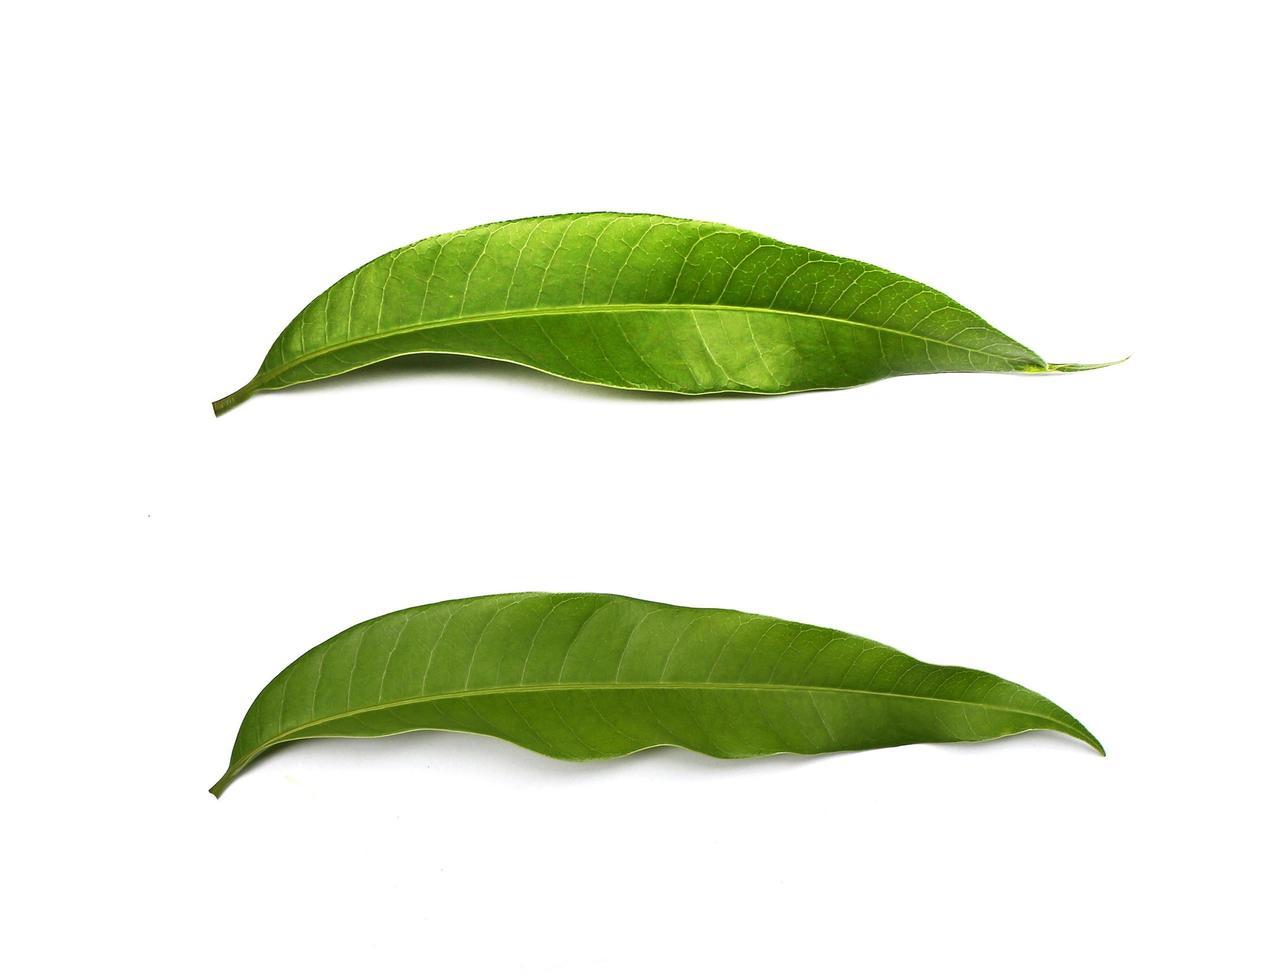 zwei grüne Blätter isoliert foto